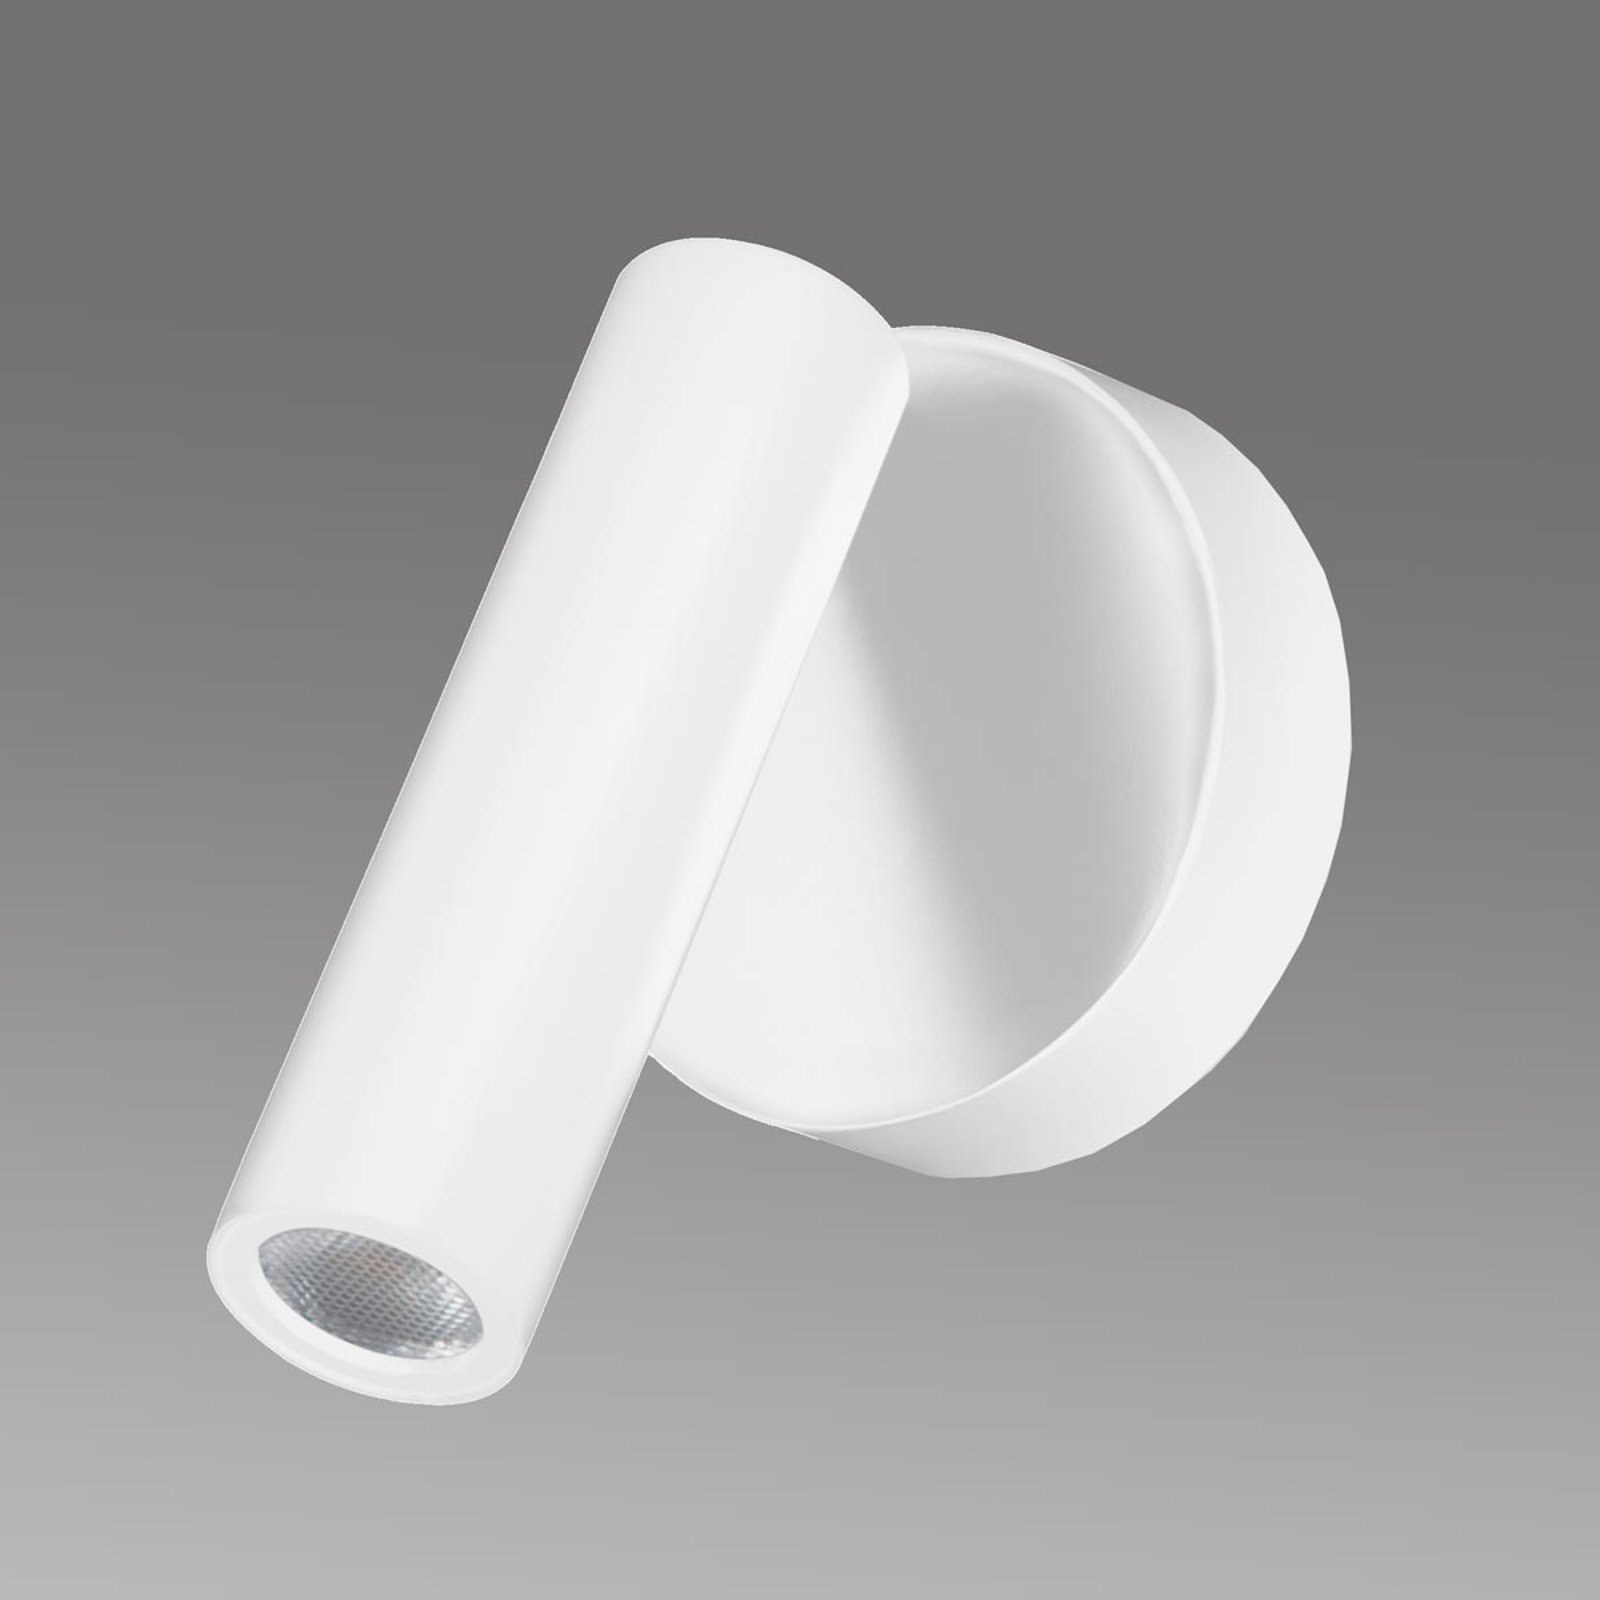 Stylus LED-veggspot, hvit